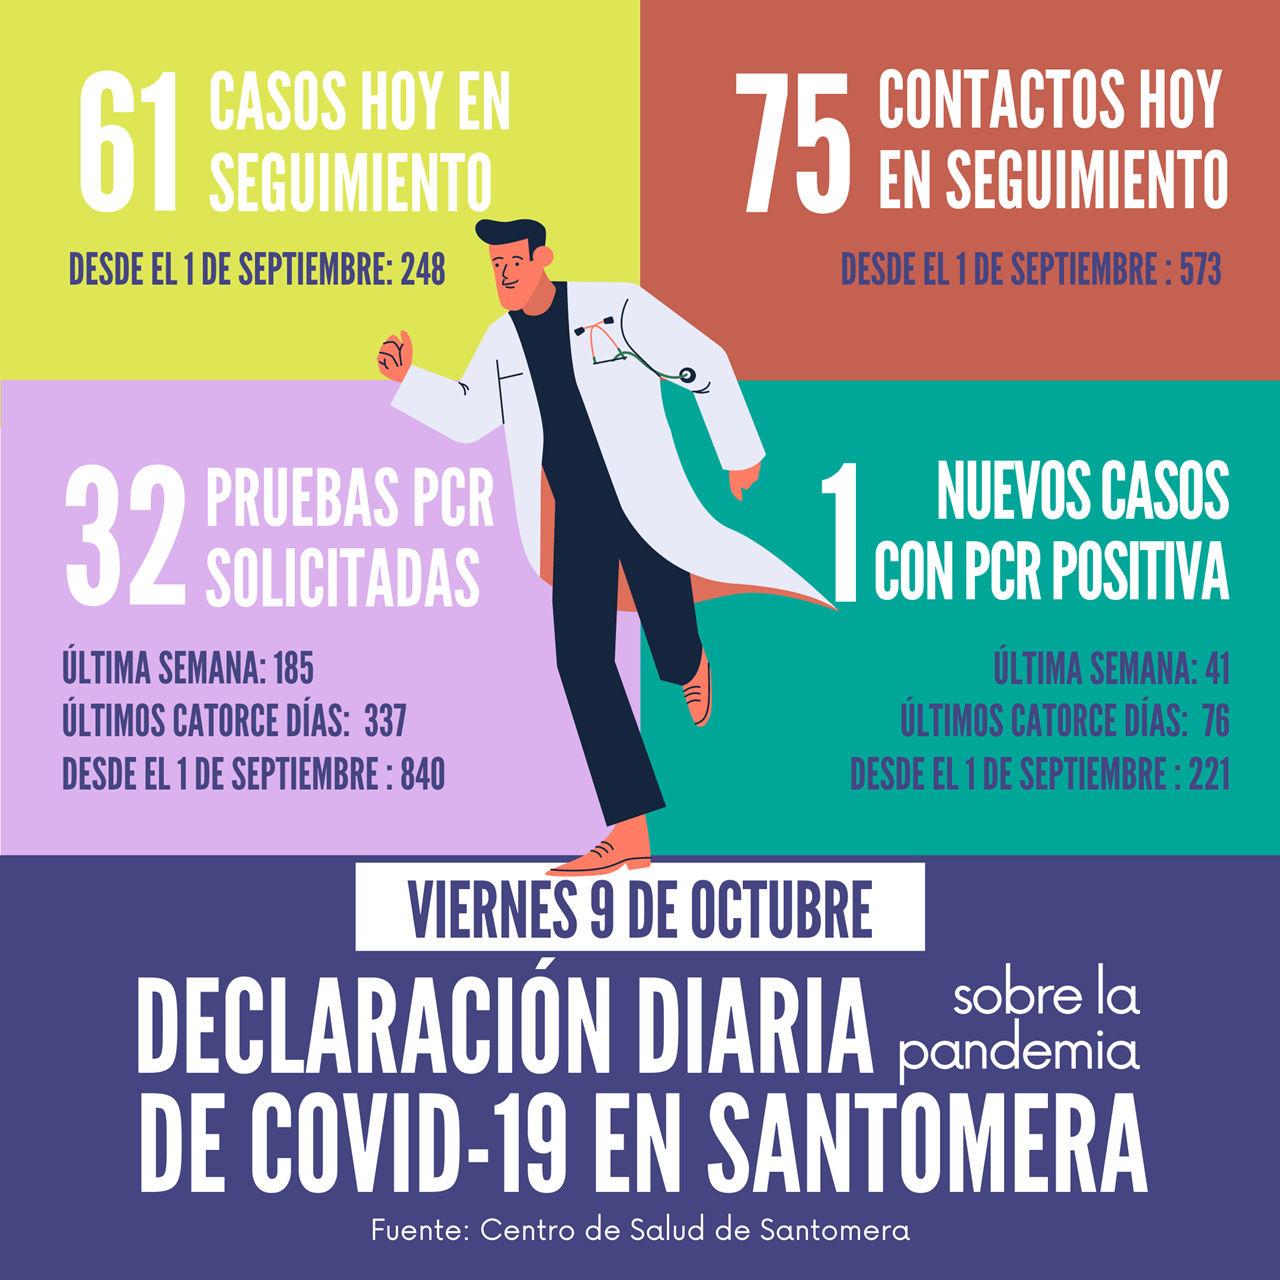 20201009_Datos COVID-19 Santomera